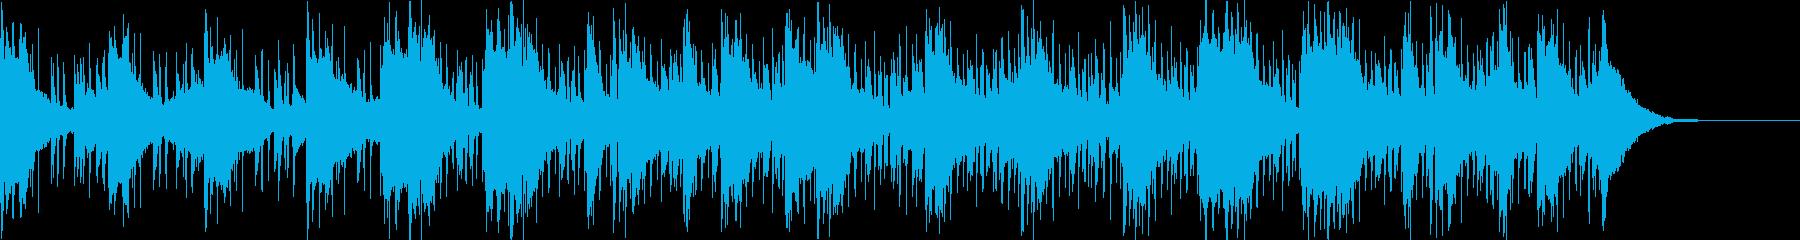 Pf「月夜」和風現代ジャズの再生済みの波形